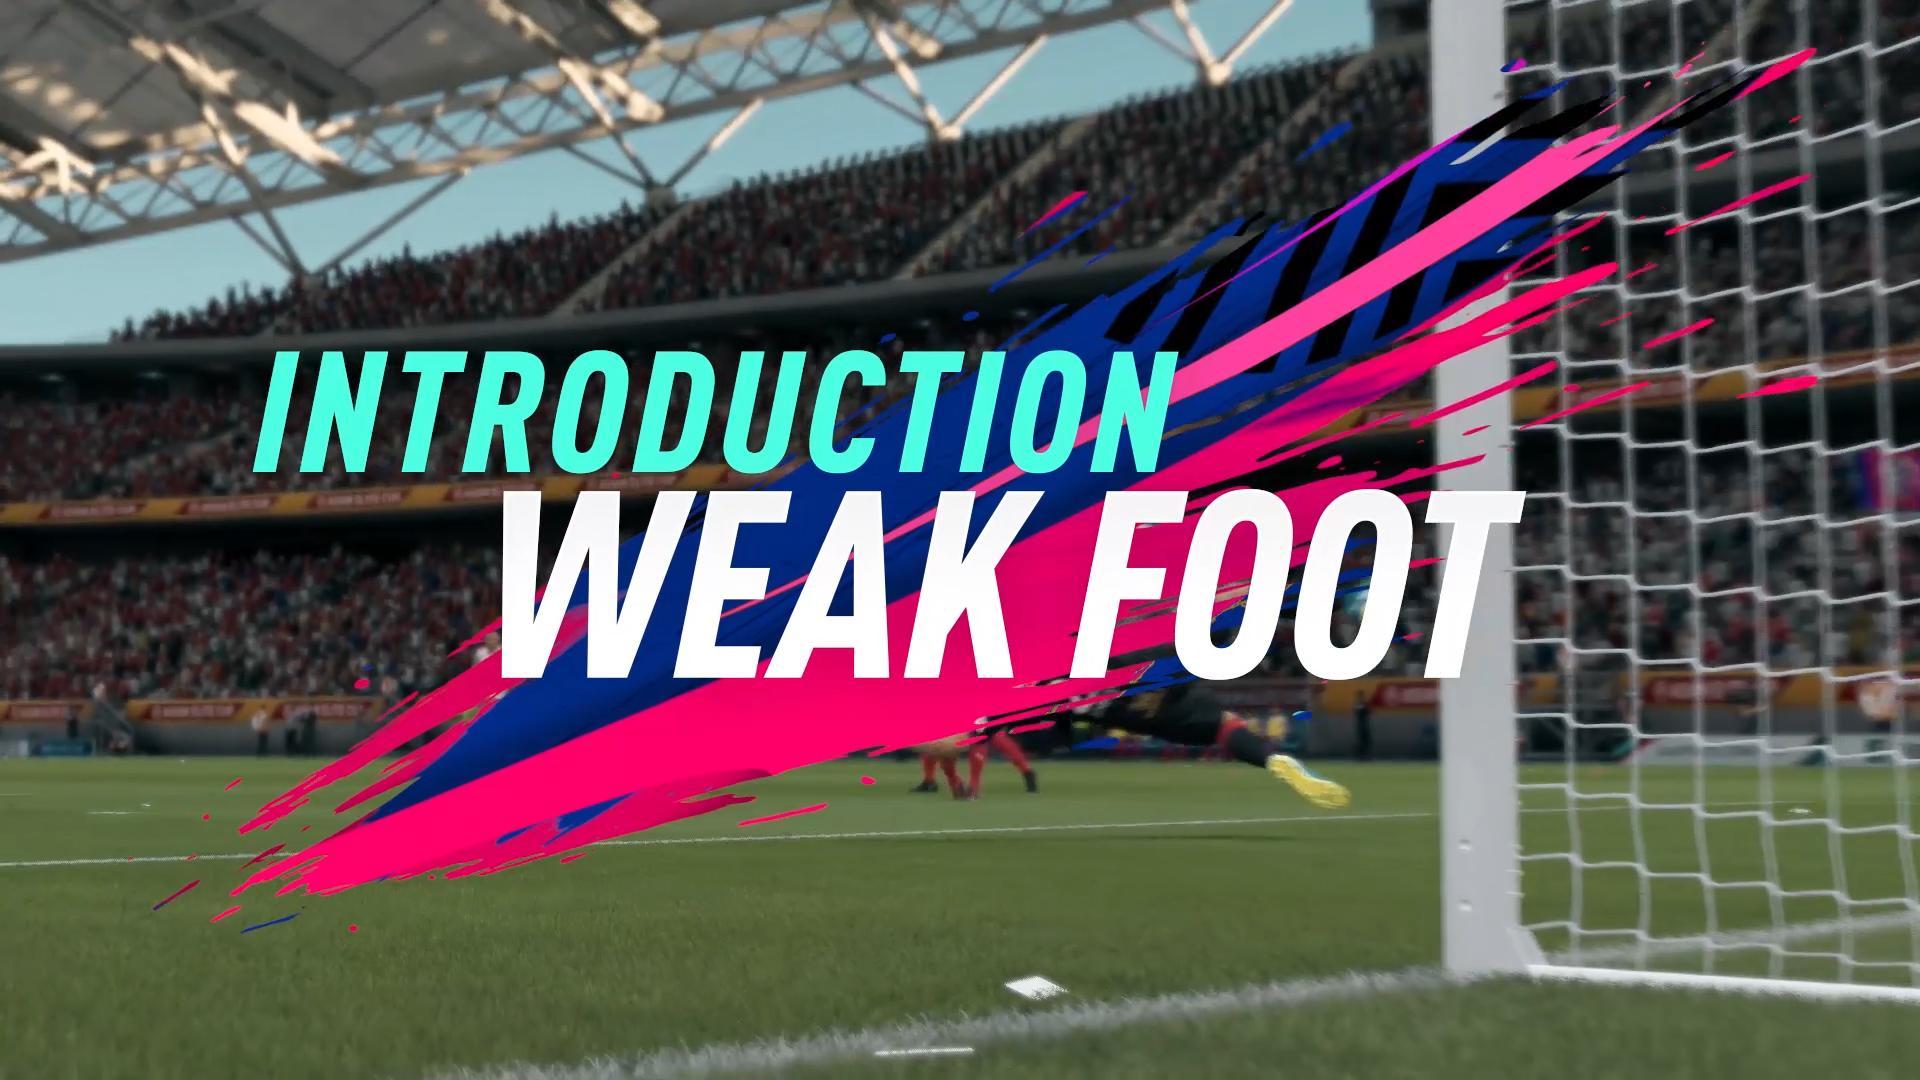 FIFA 19 WEAK VS STRONG FOOT